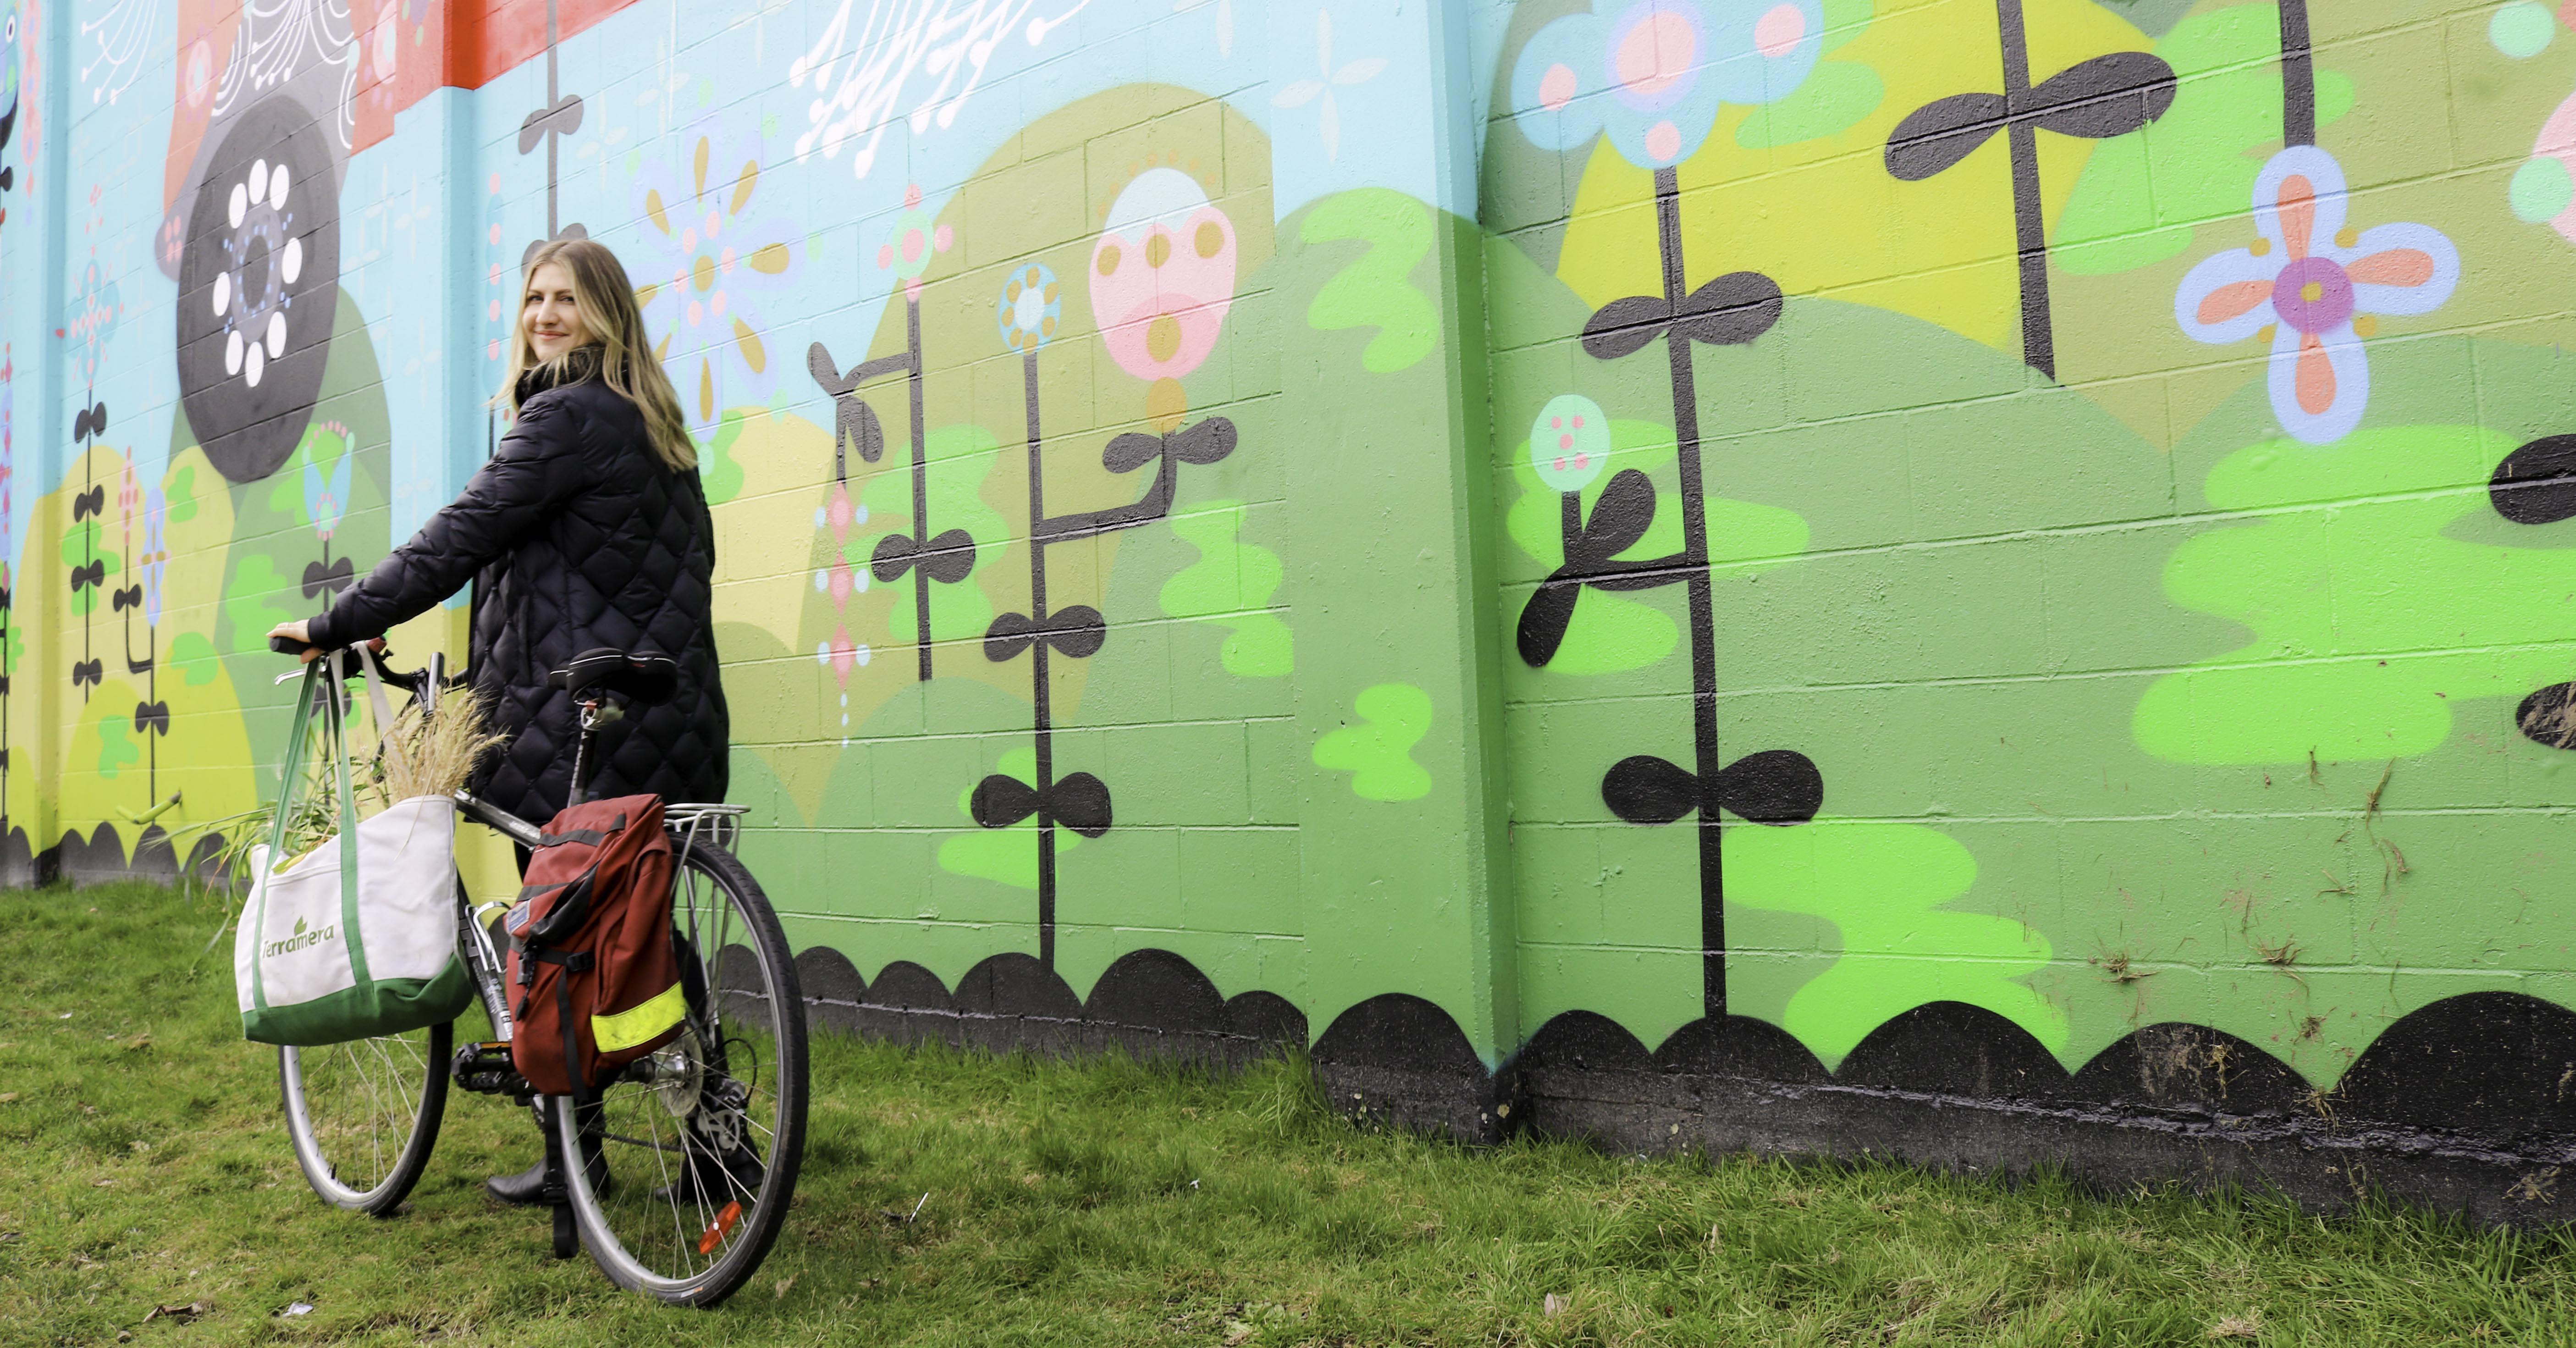 Bike to work is a sustainability habit